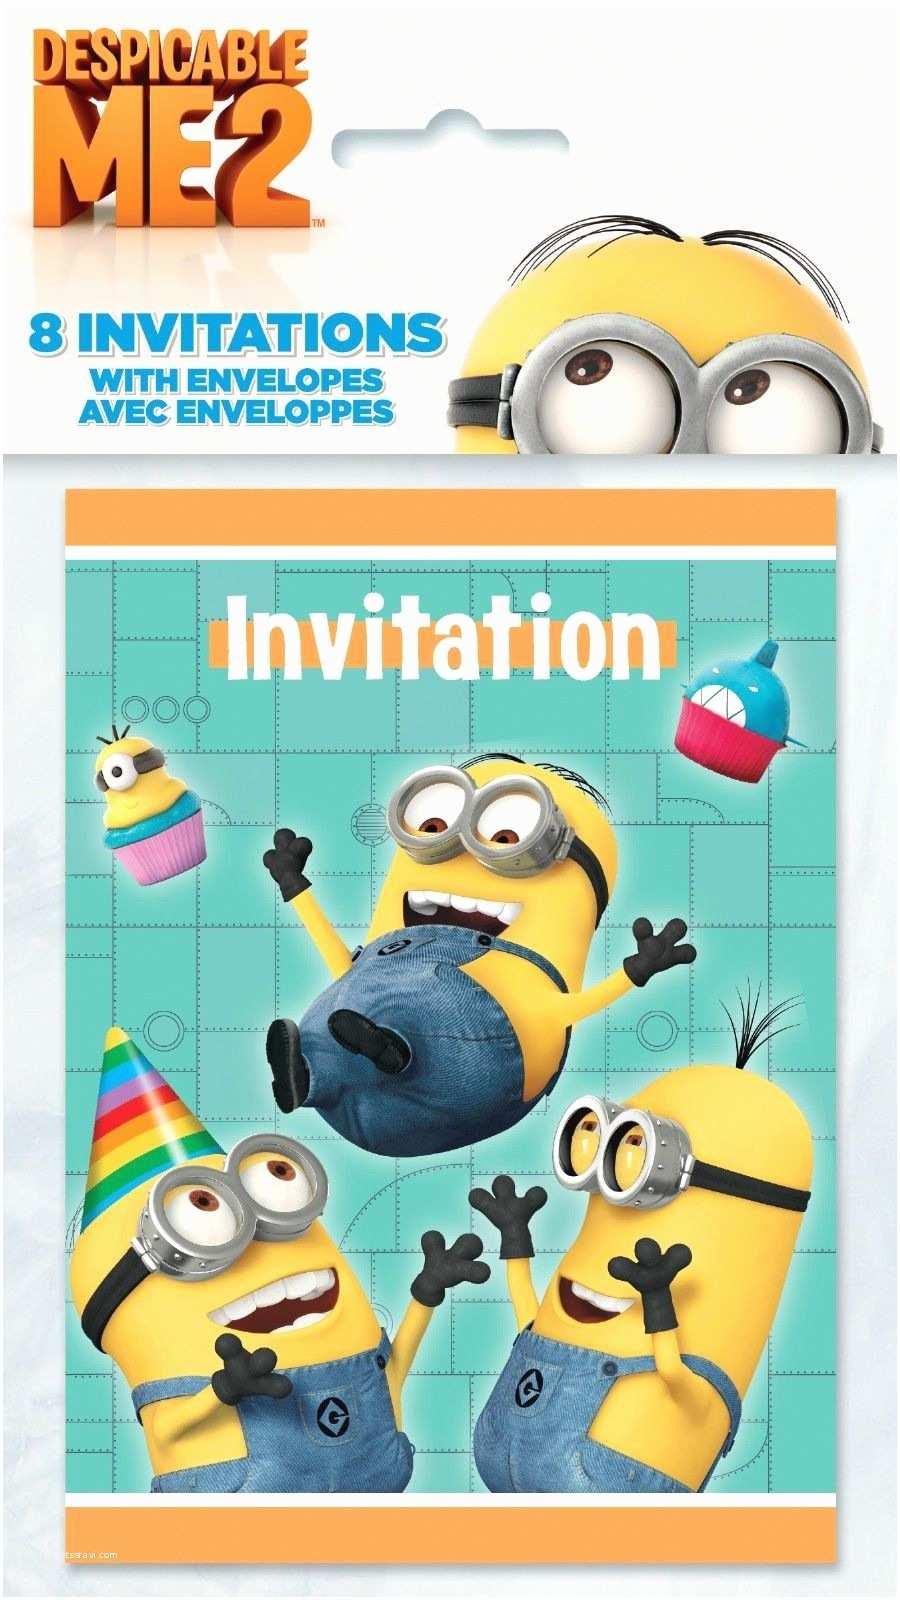 Despicable Me Birthday Invitations Despicable Me 2 Minions Party Birthday Invitations with